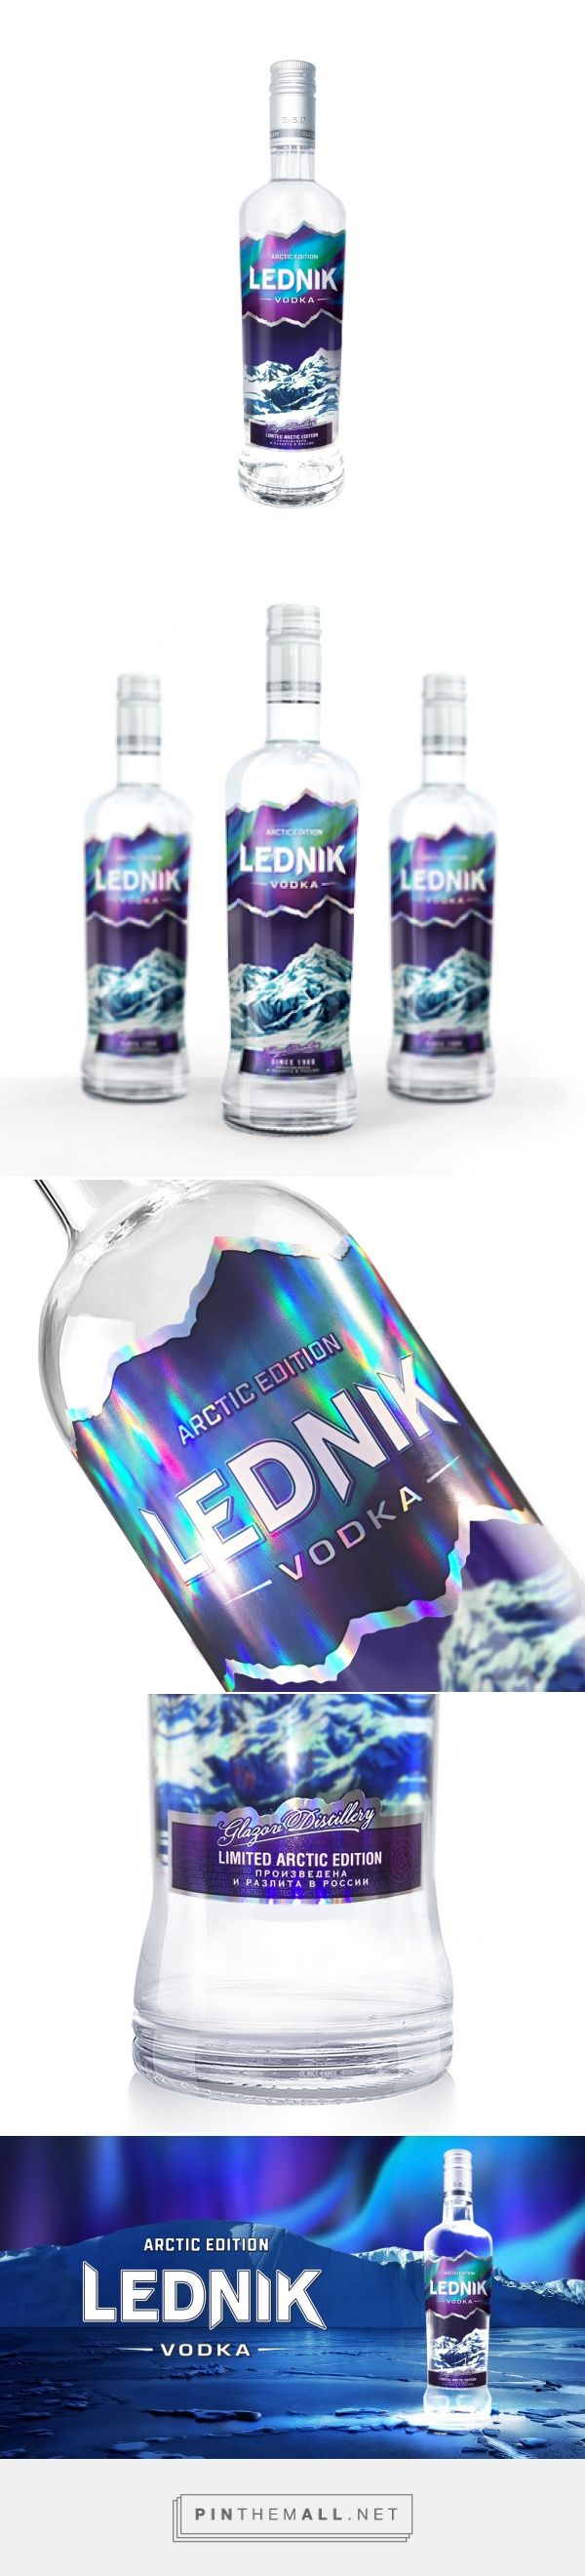 Lednik Arctic Edition packaging design by Ural Branding Company - http://www.packagingoftheworld.com/2017/06/lednik-arctic-edition.html - created via https://pinthemall.net